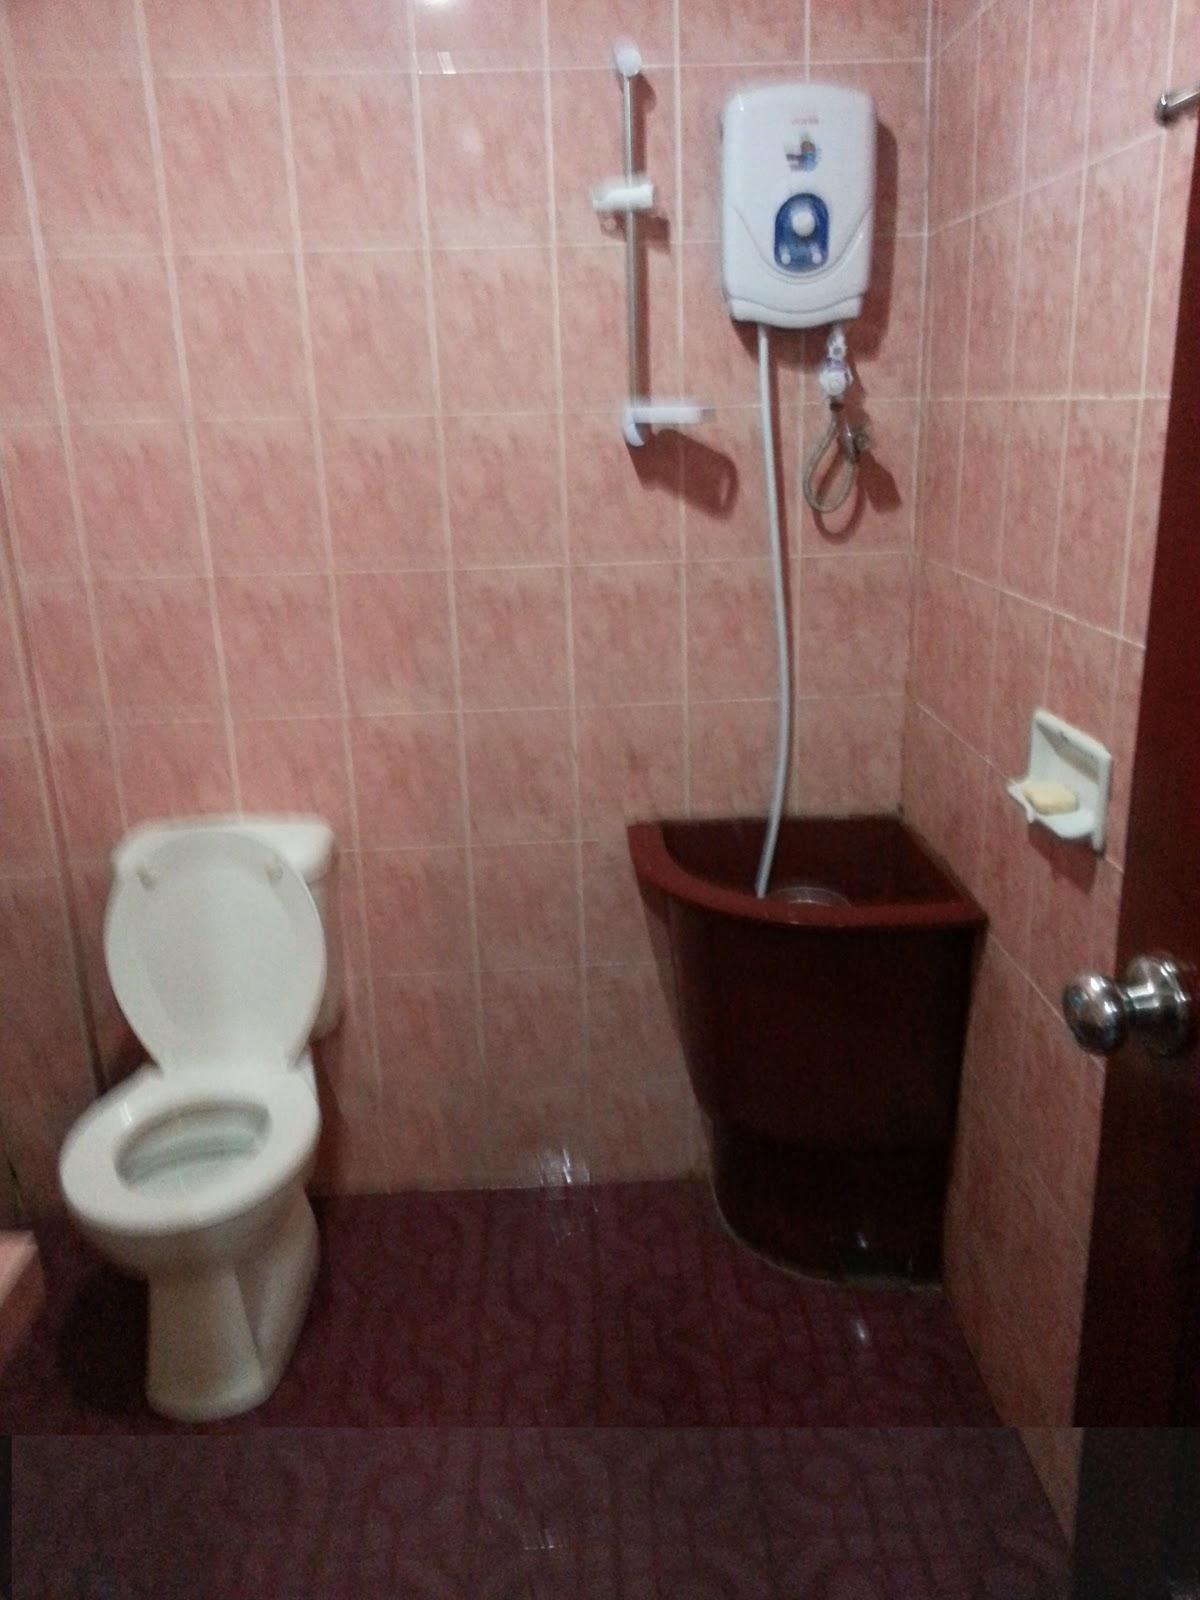 Renovating Bathroom Toilet